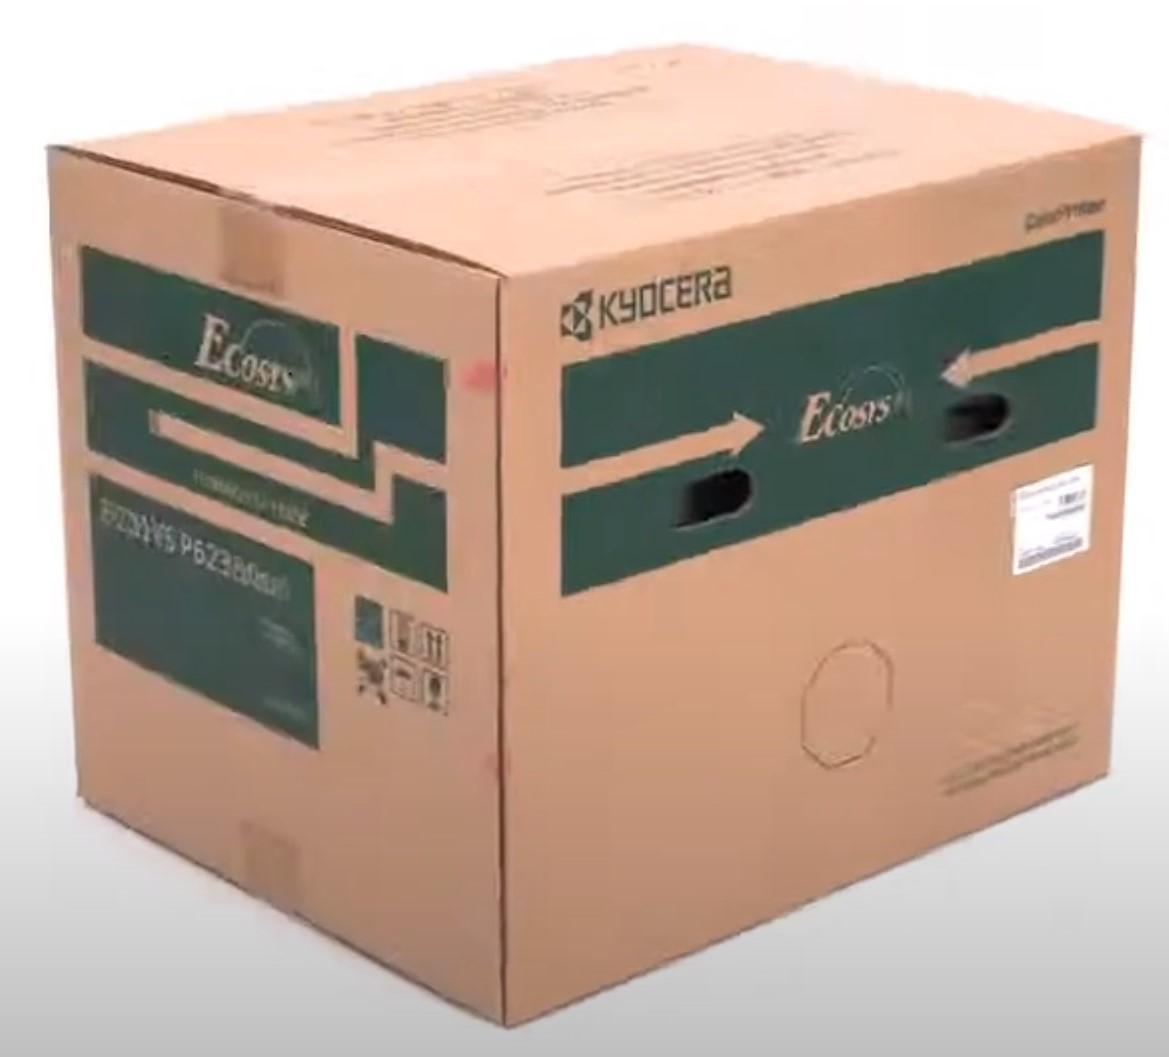 KyoceraSkelp-opakowanie-drukarki-Kyocera